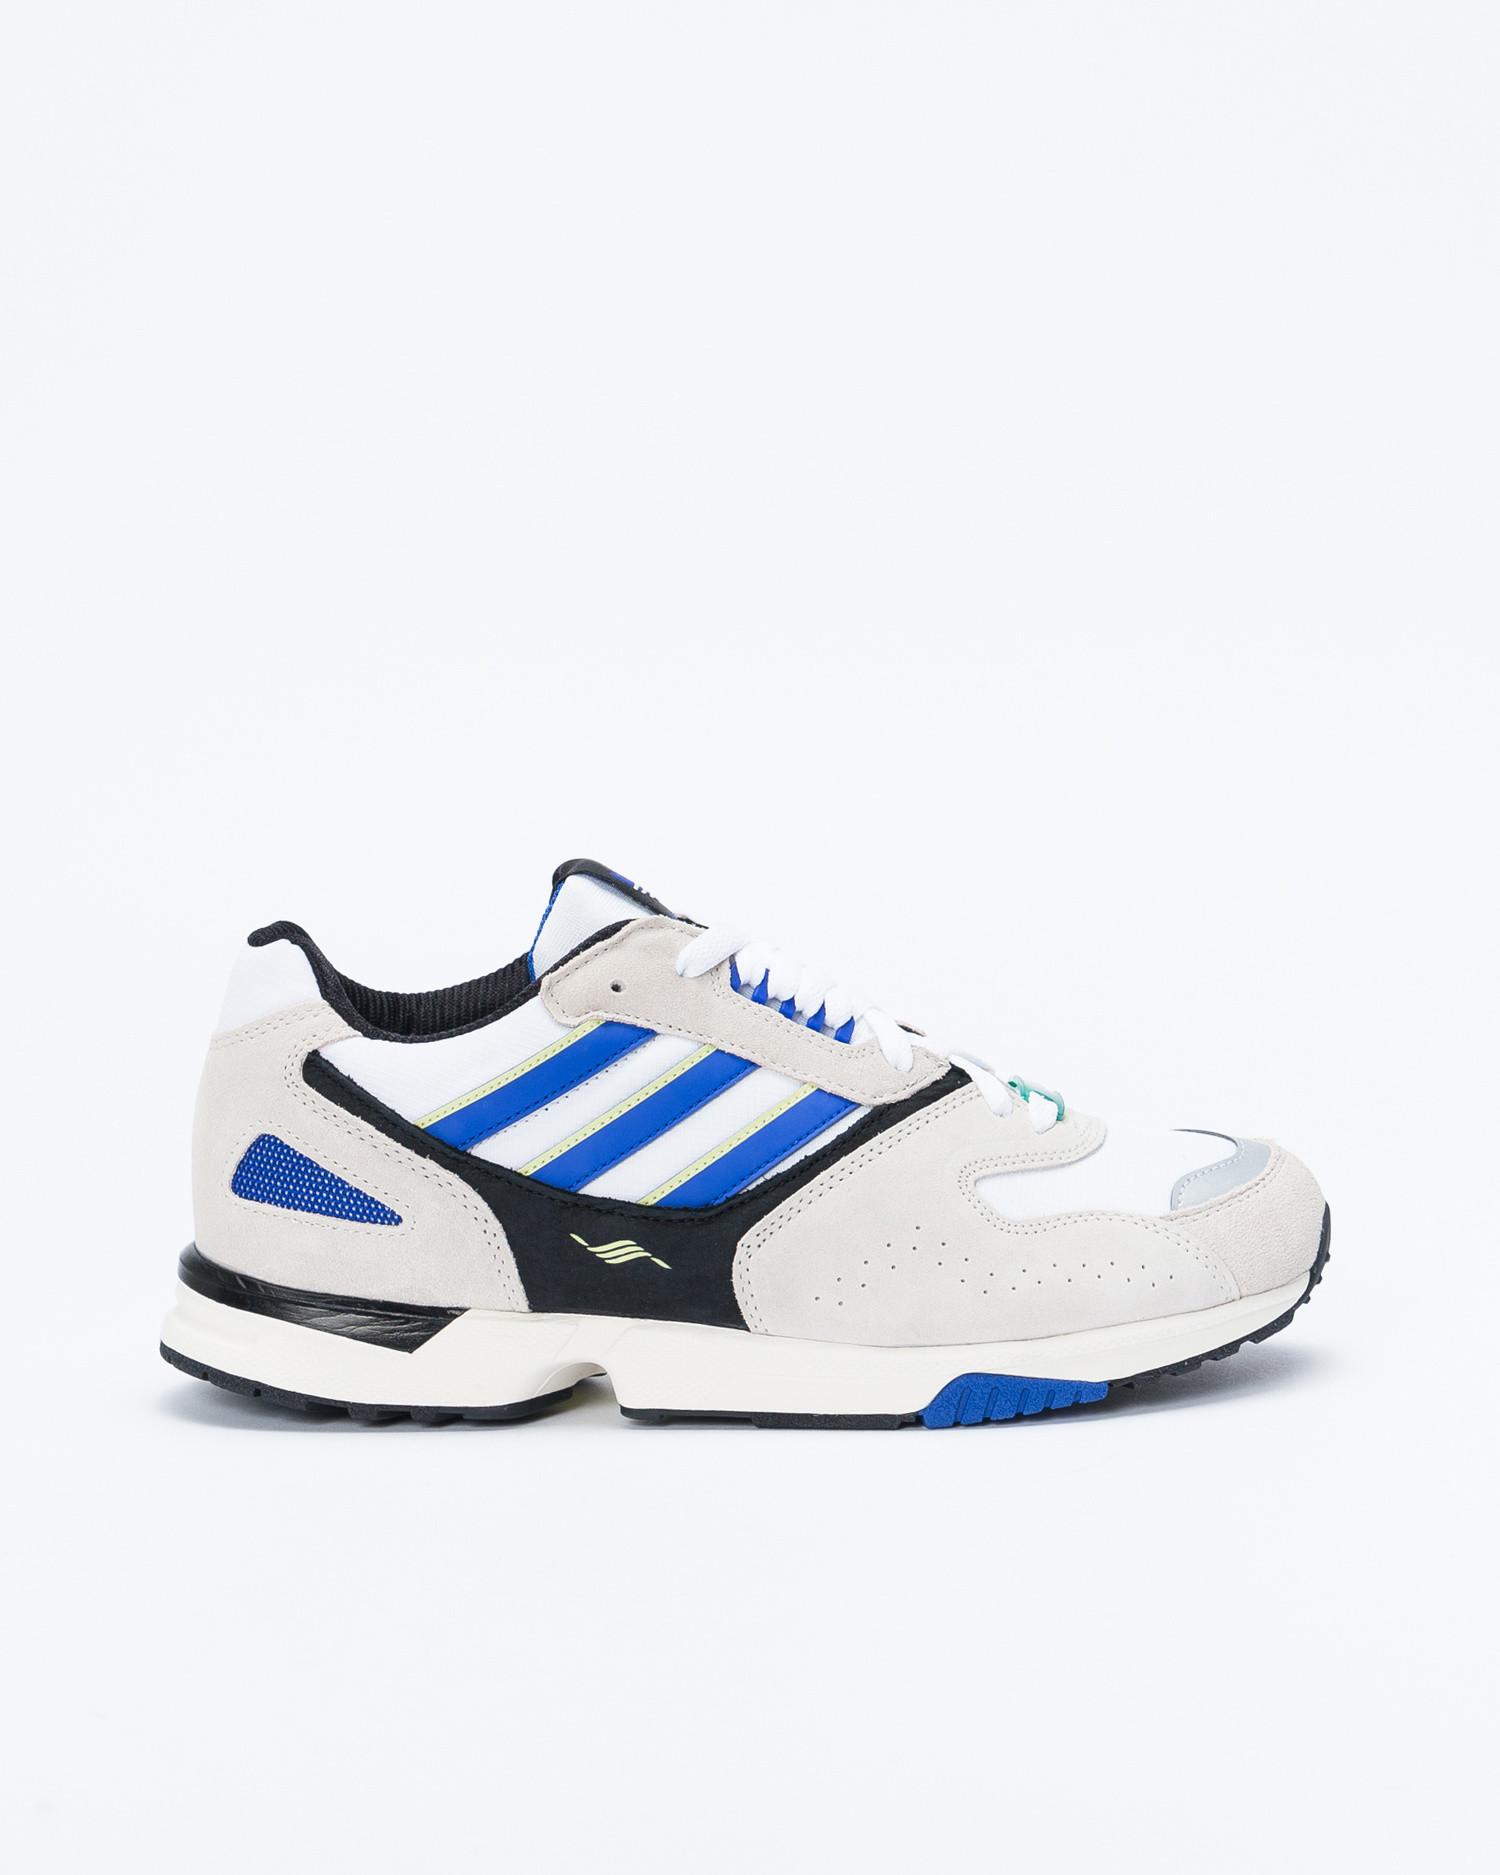 Adidas adidas x Alltimers ZX4000 Clear